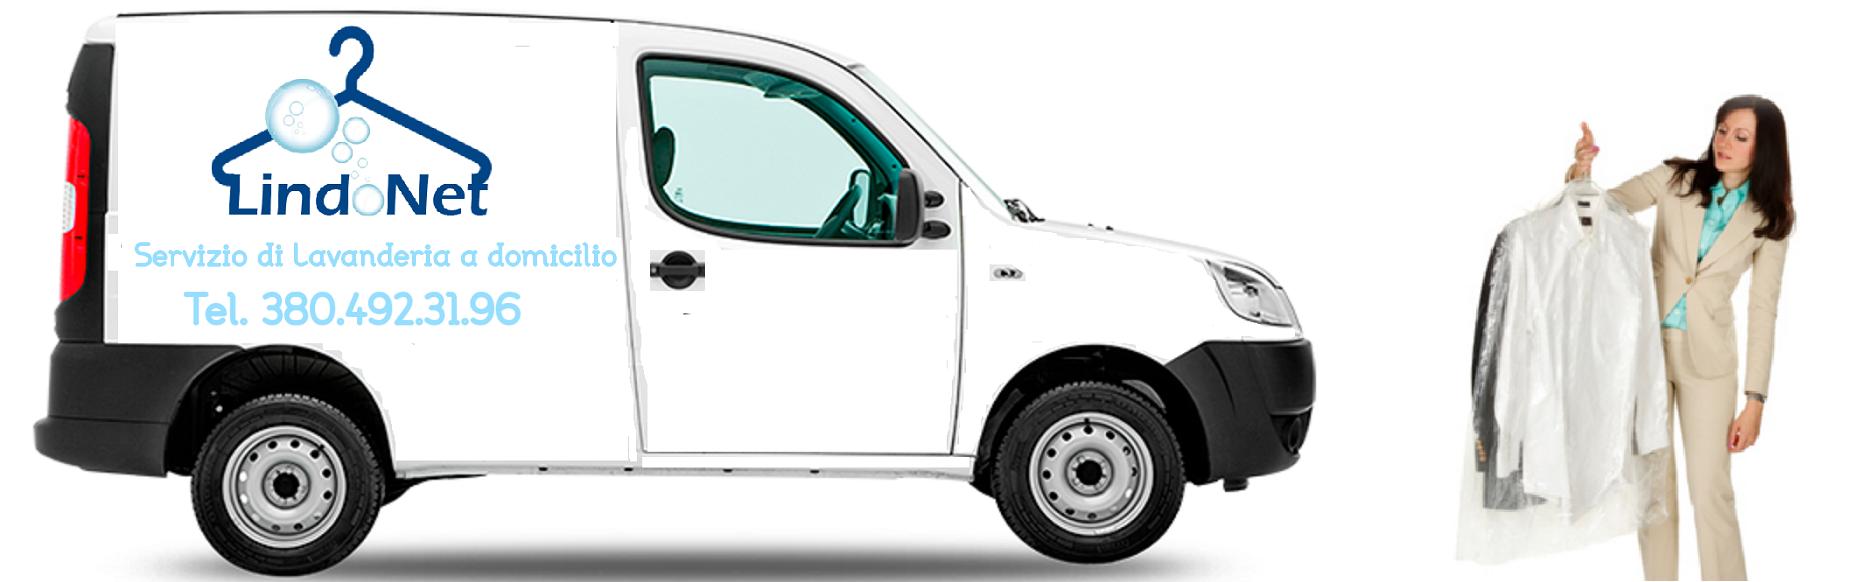 furgone_lindonet2